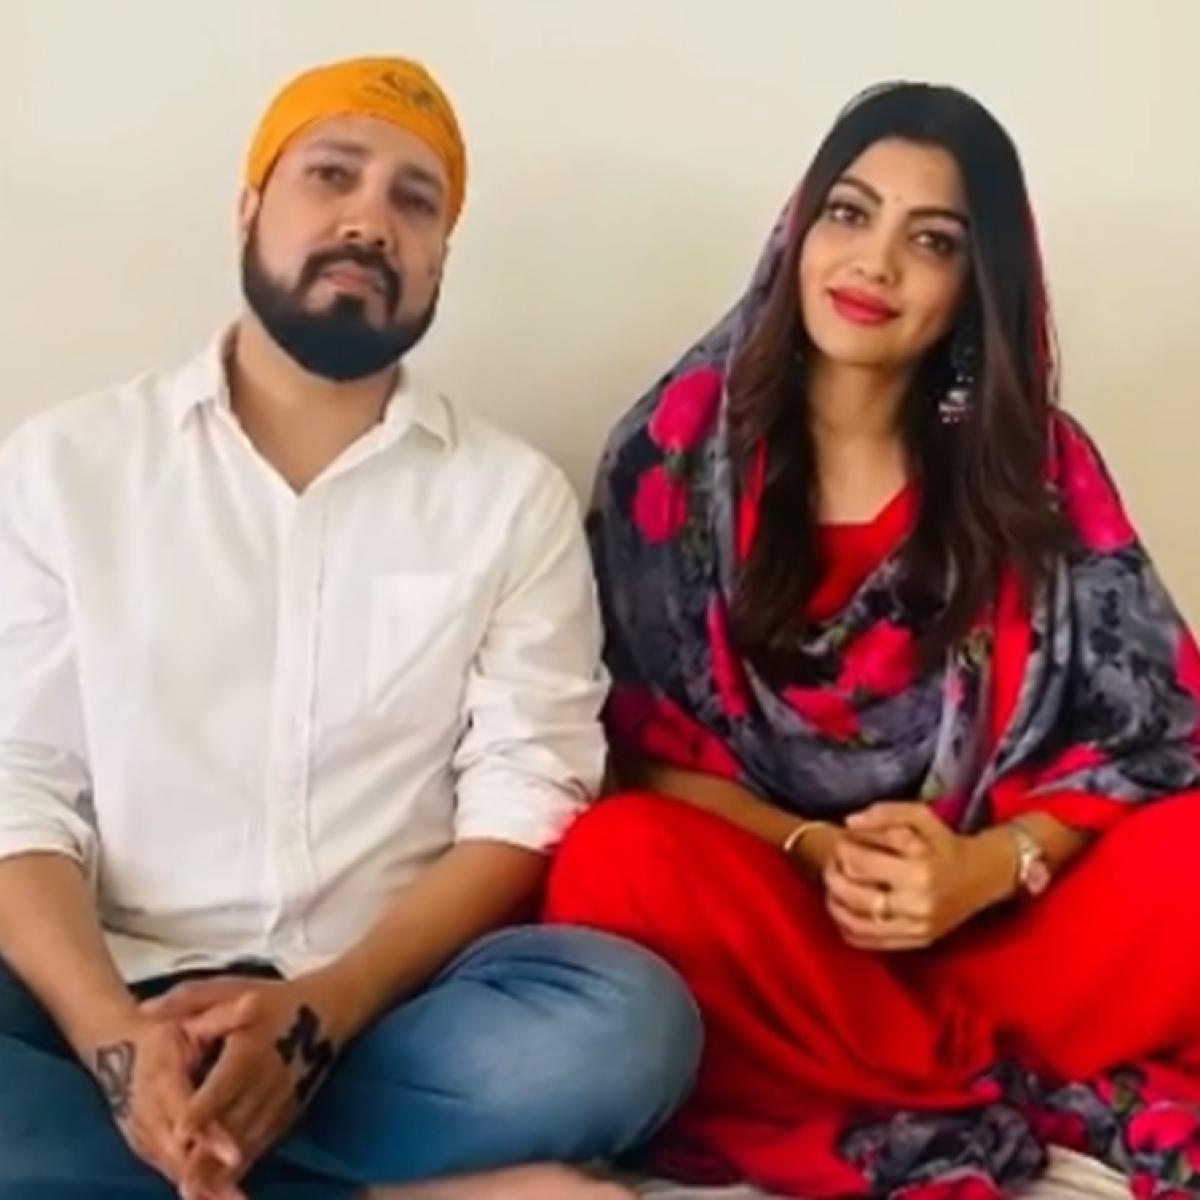 Mika Singh dating 'Bigg Boss 13' contestant Paras Chhabra's ex-girlfriend Akanksha Puri?